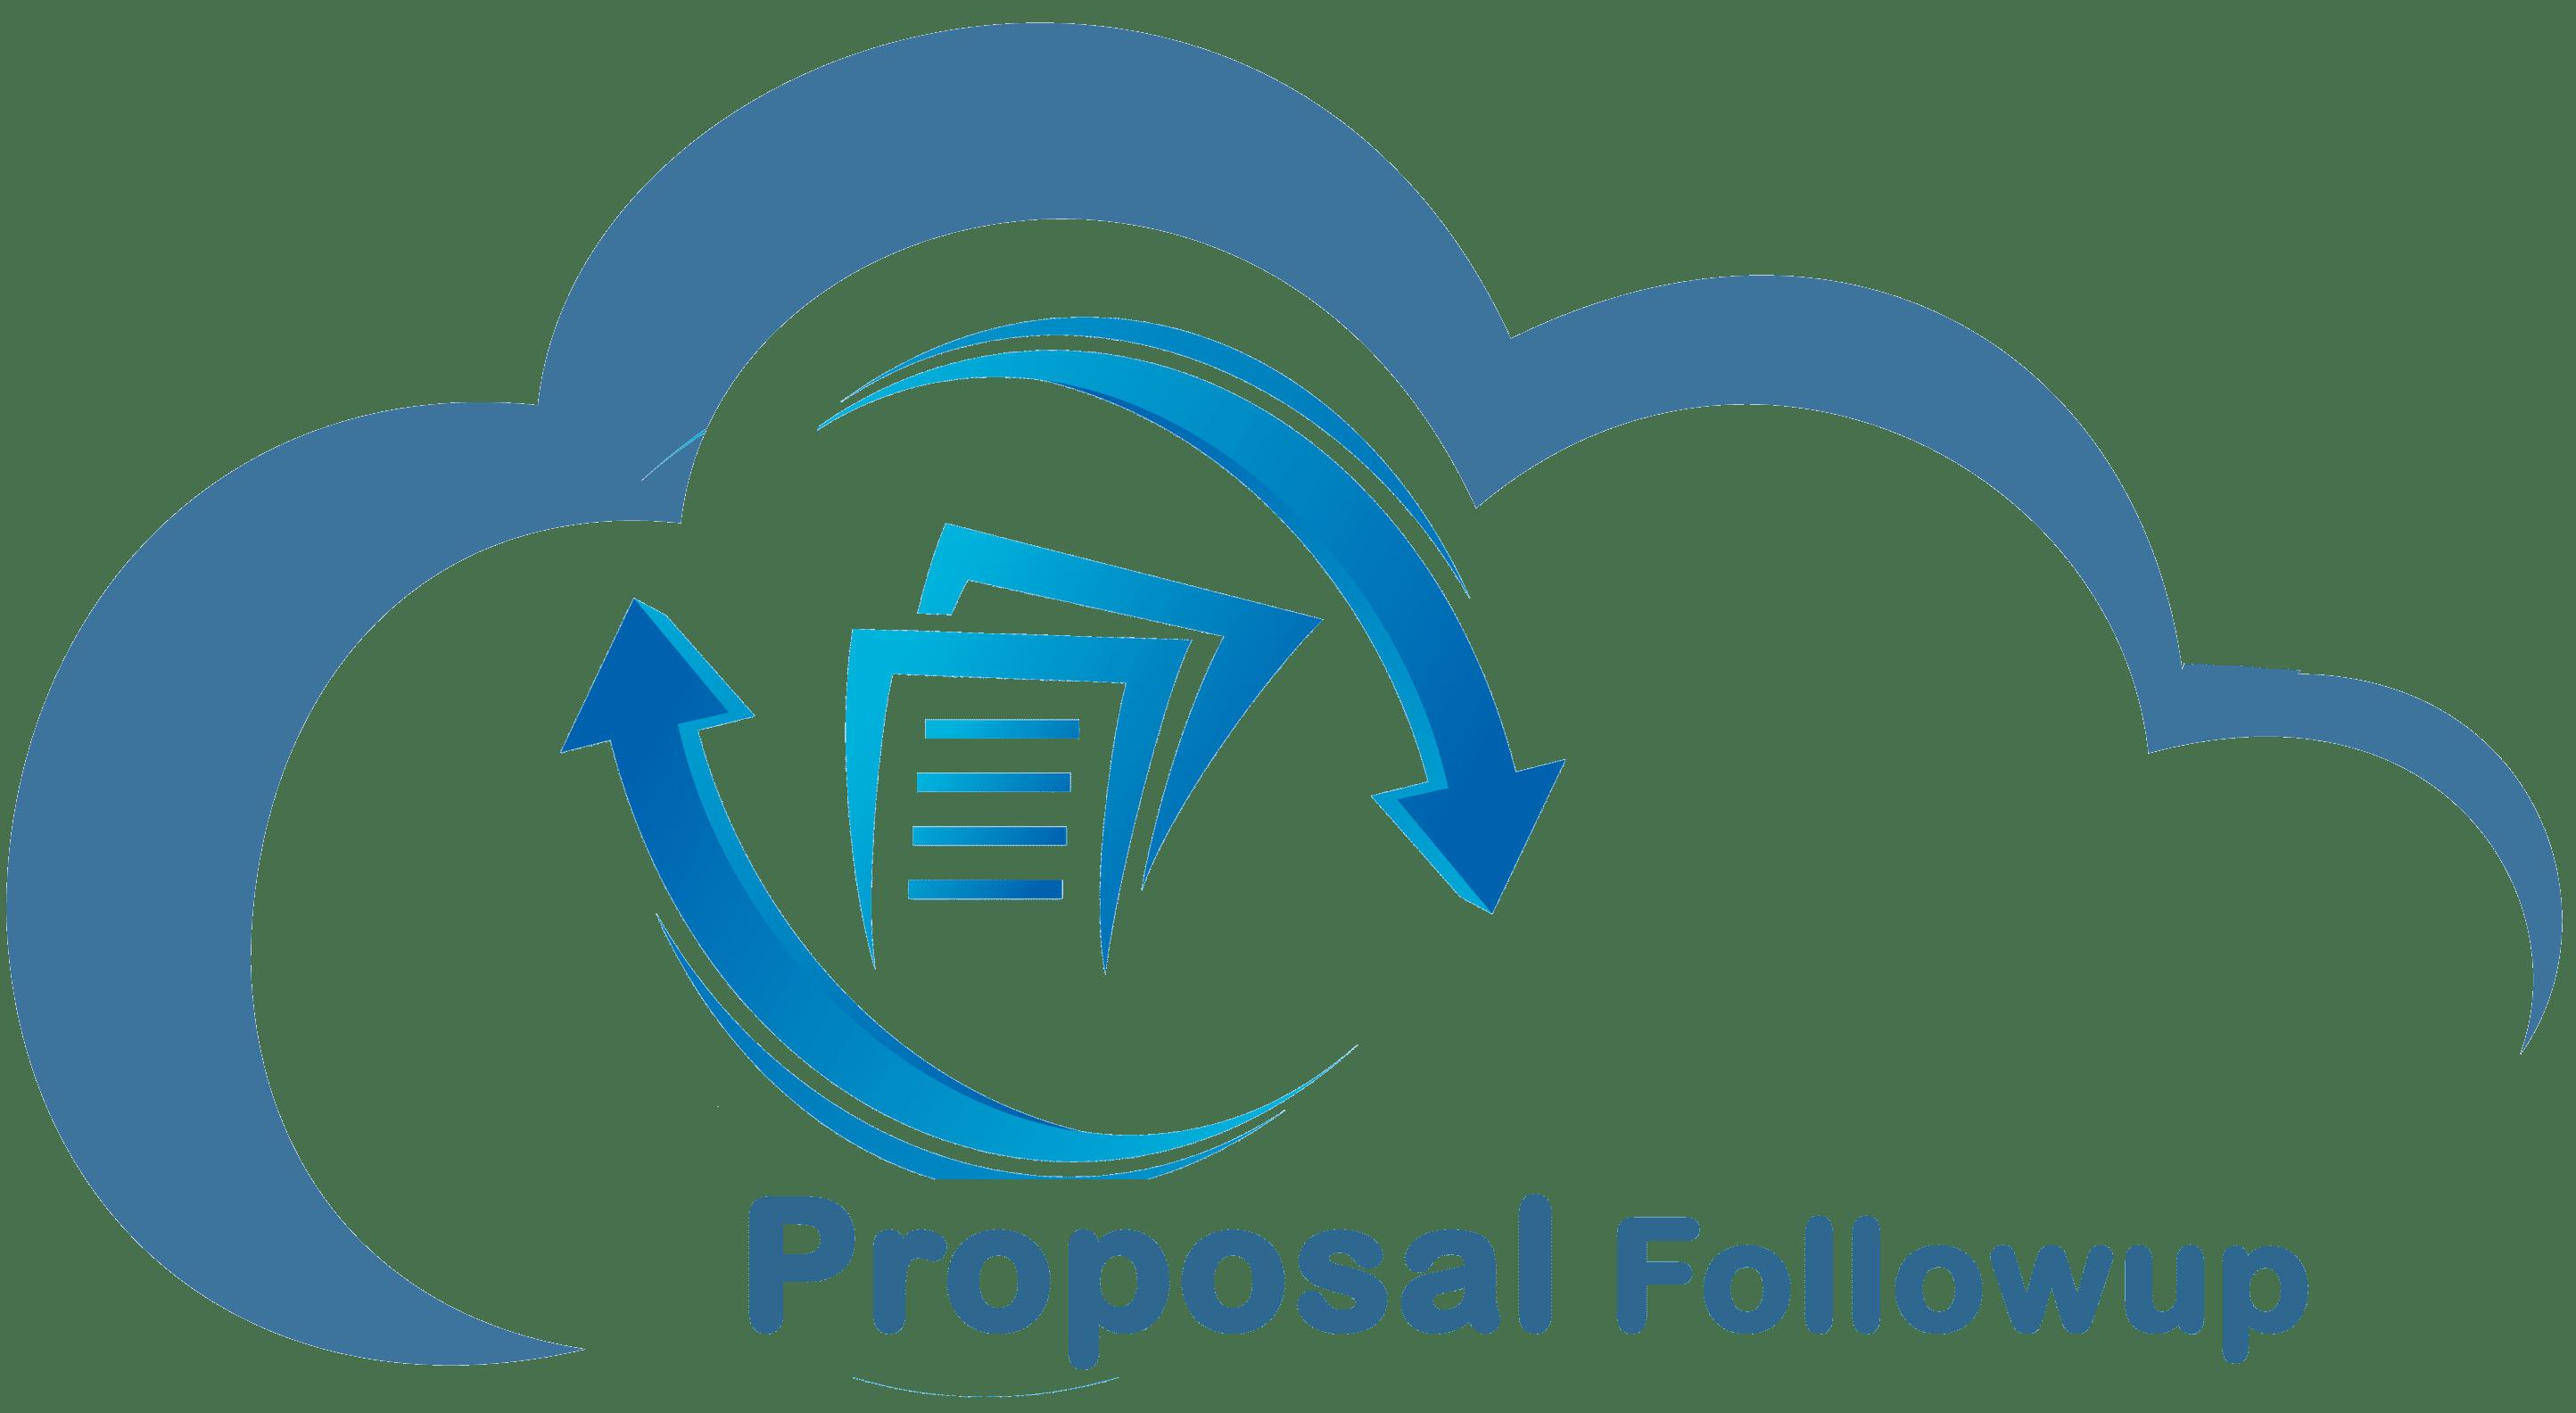 Proposal Followup Final